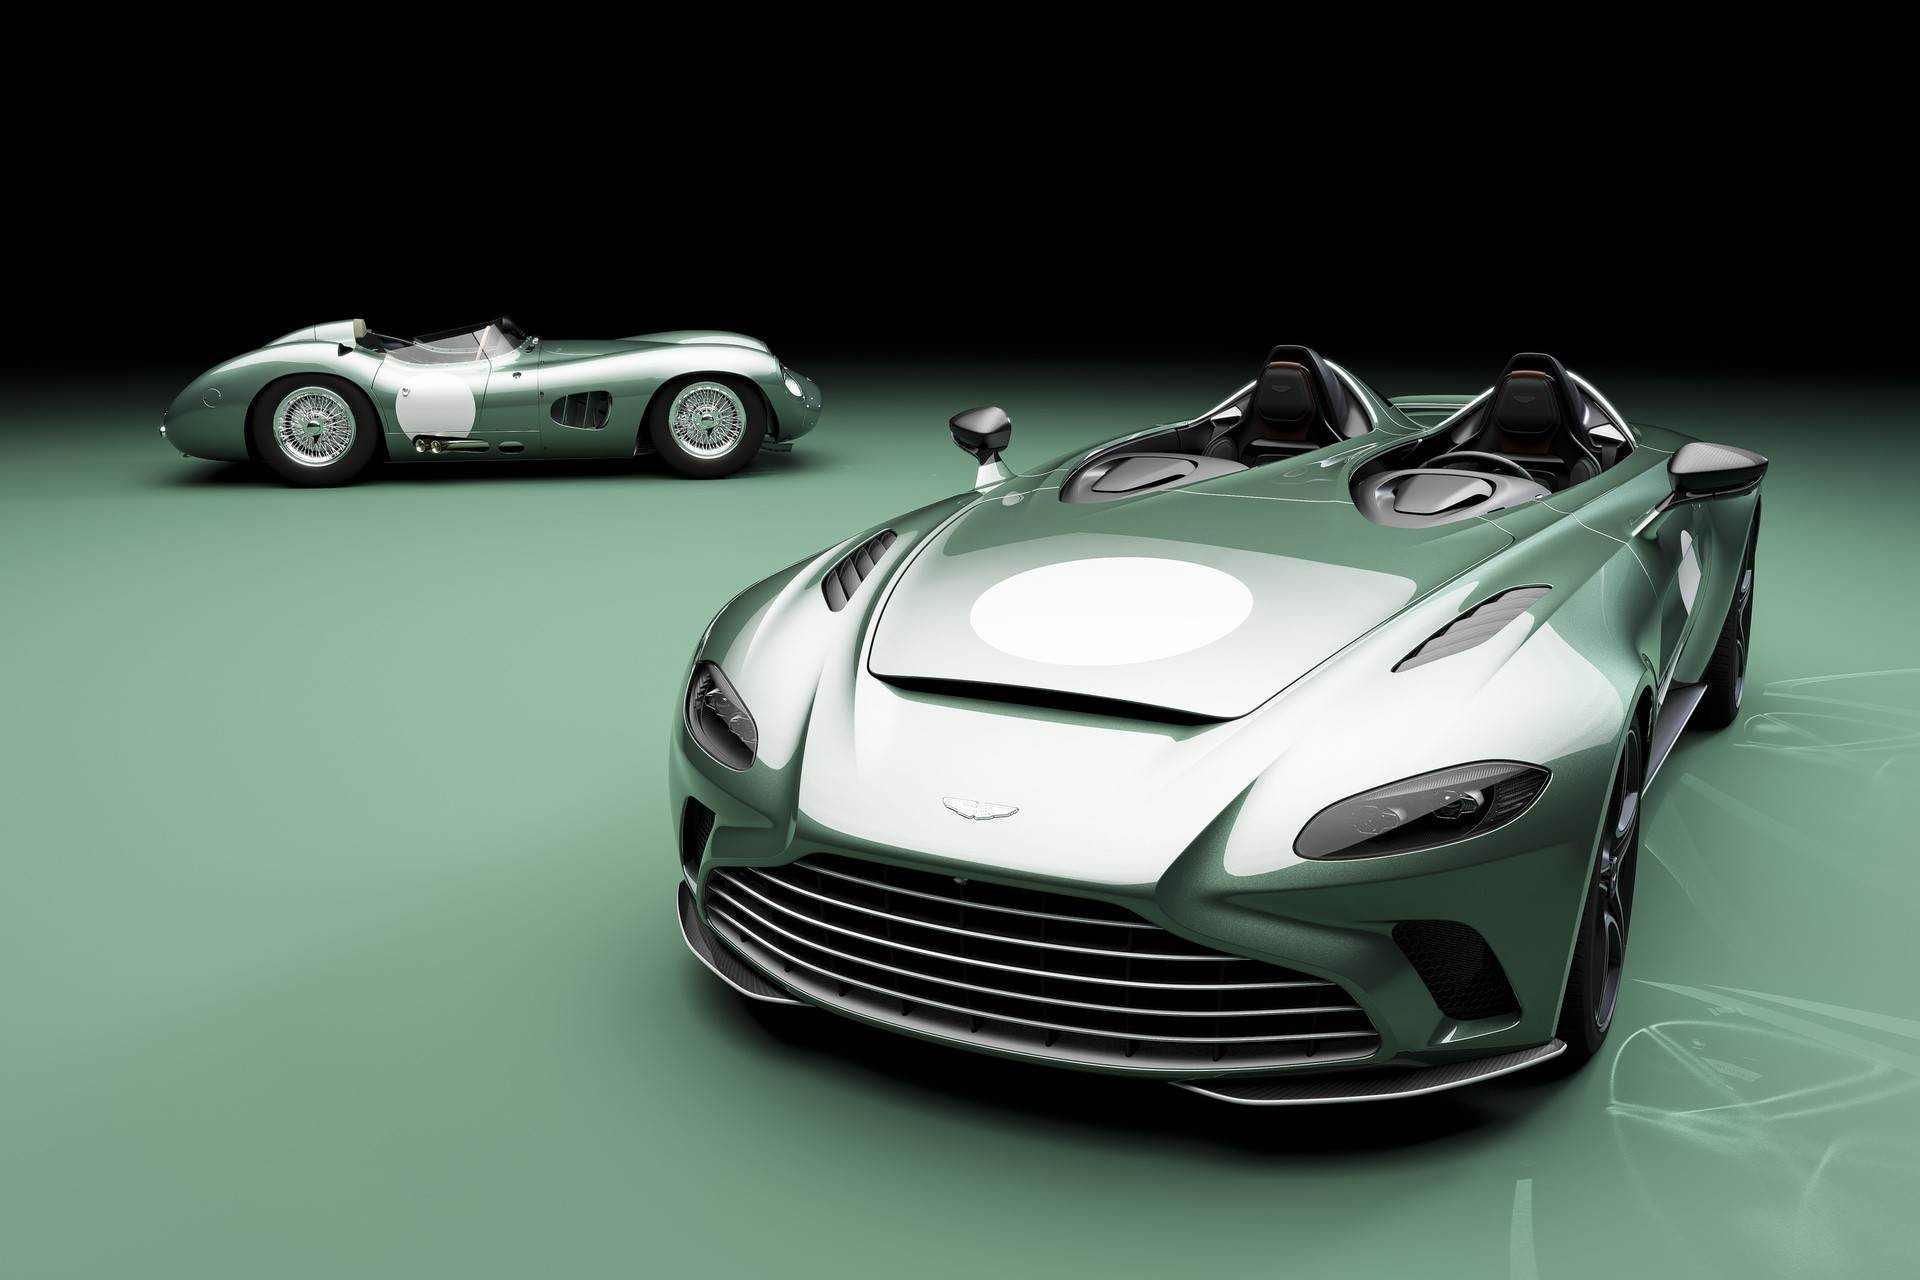 Aston_Martin_V12_Speedster_DBR1_Pack-0004